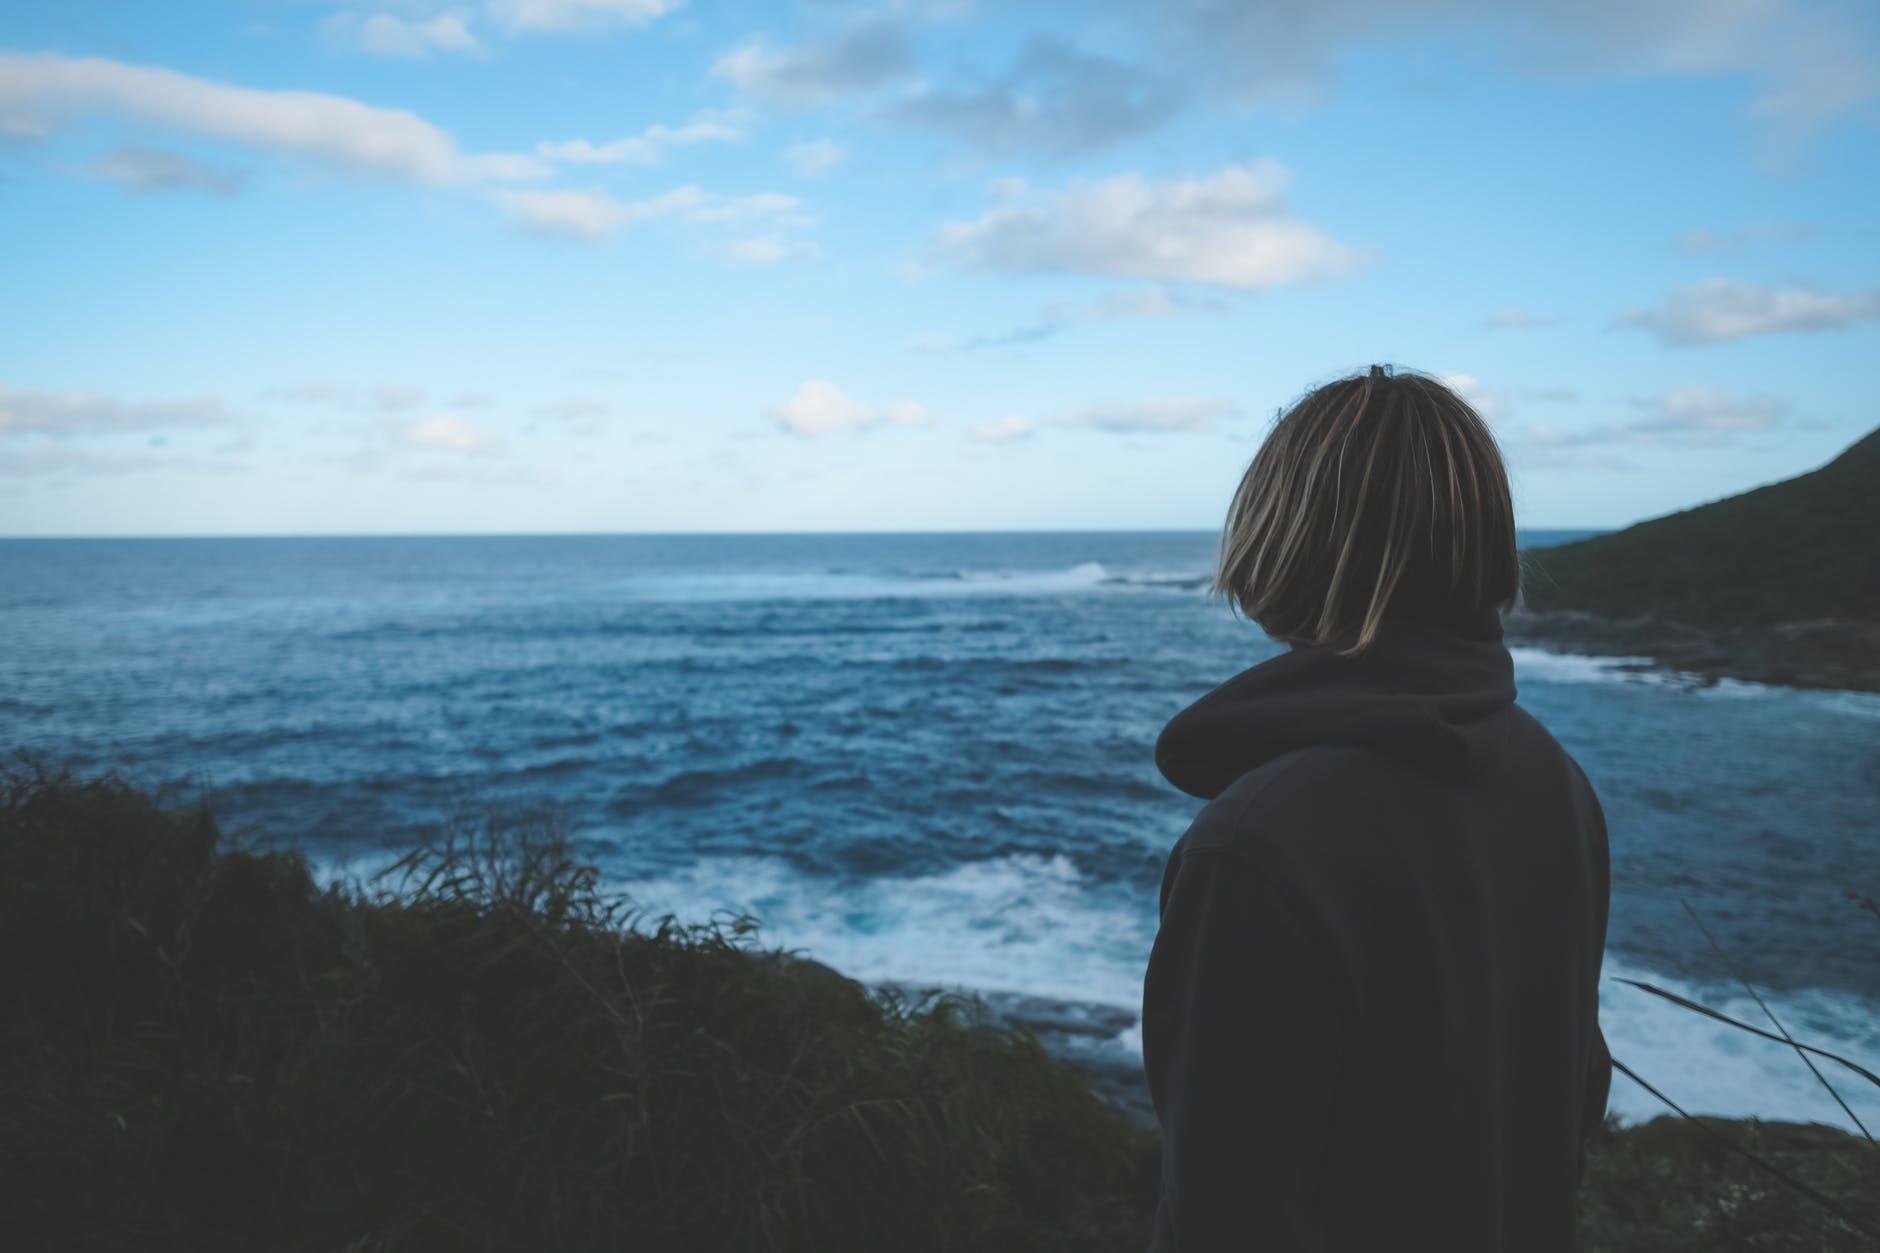 anonymous woman admiring wavy blue sea during trip at sundown